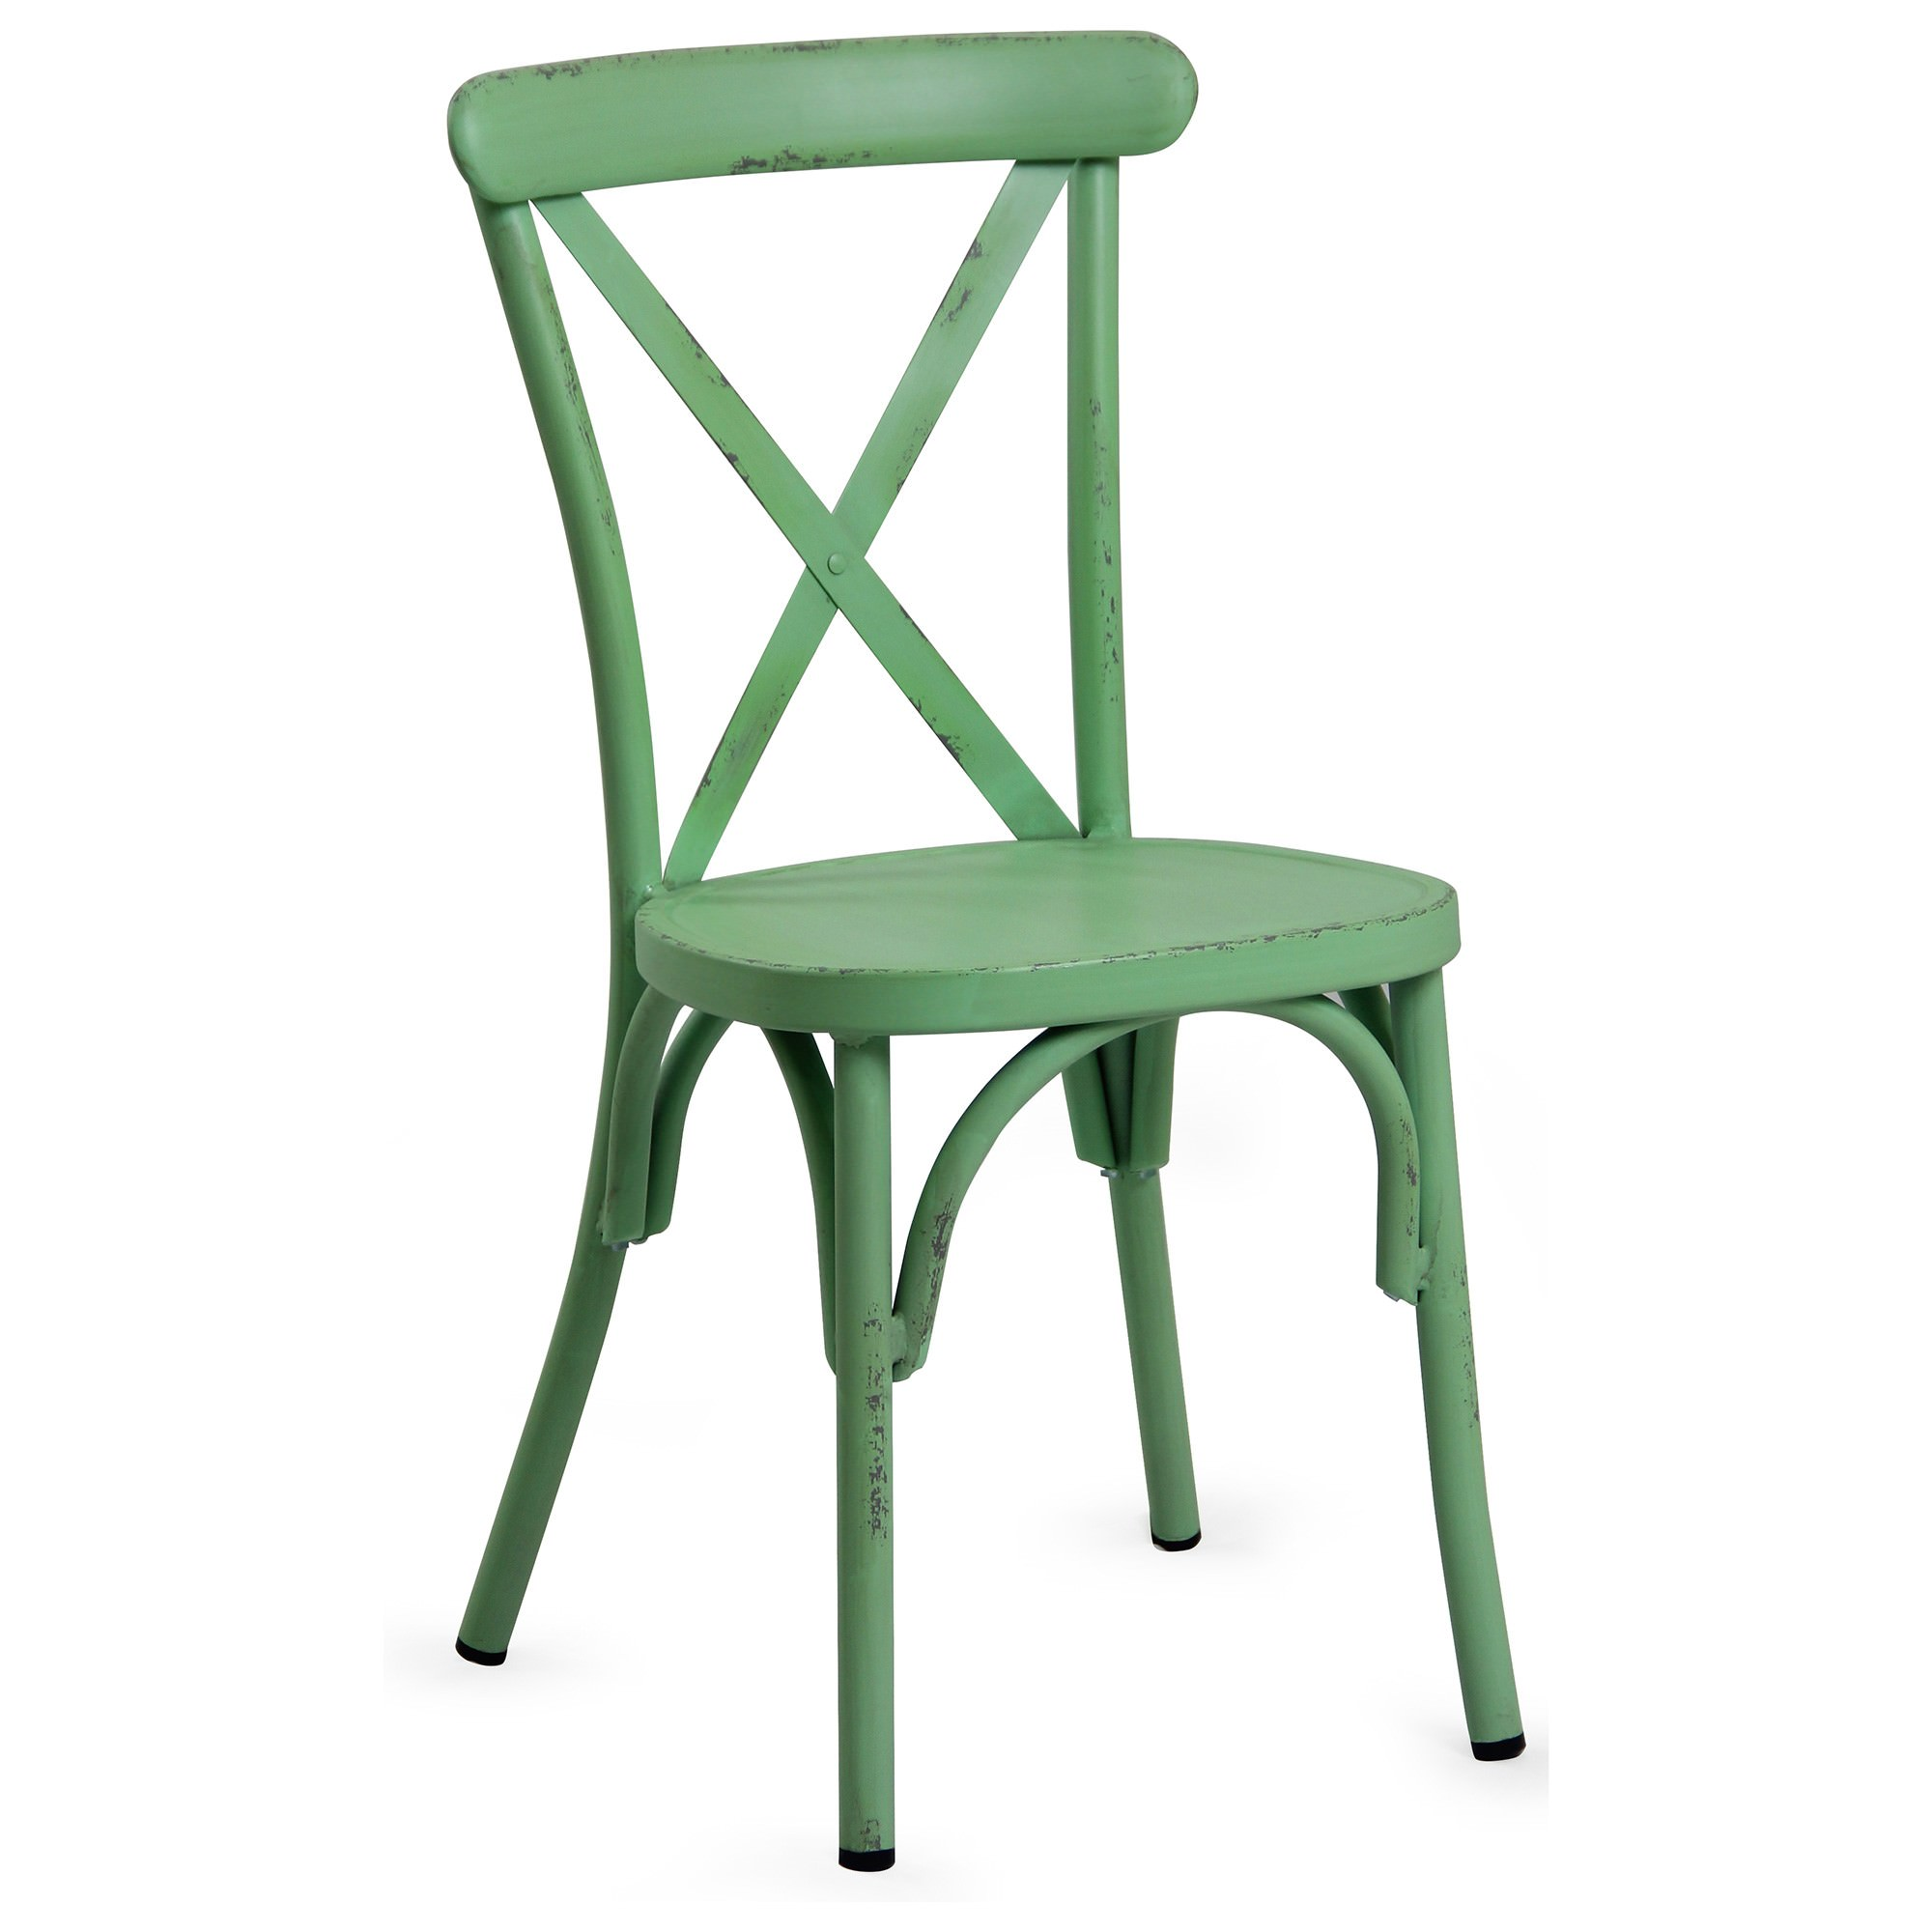 Set of 2 Ochey Commercial Grade Aluminium Indoor / Outdoor Cross Back Dining Chairs, Distressed Green